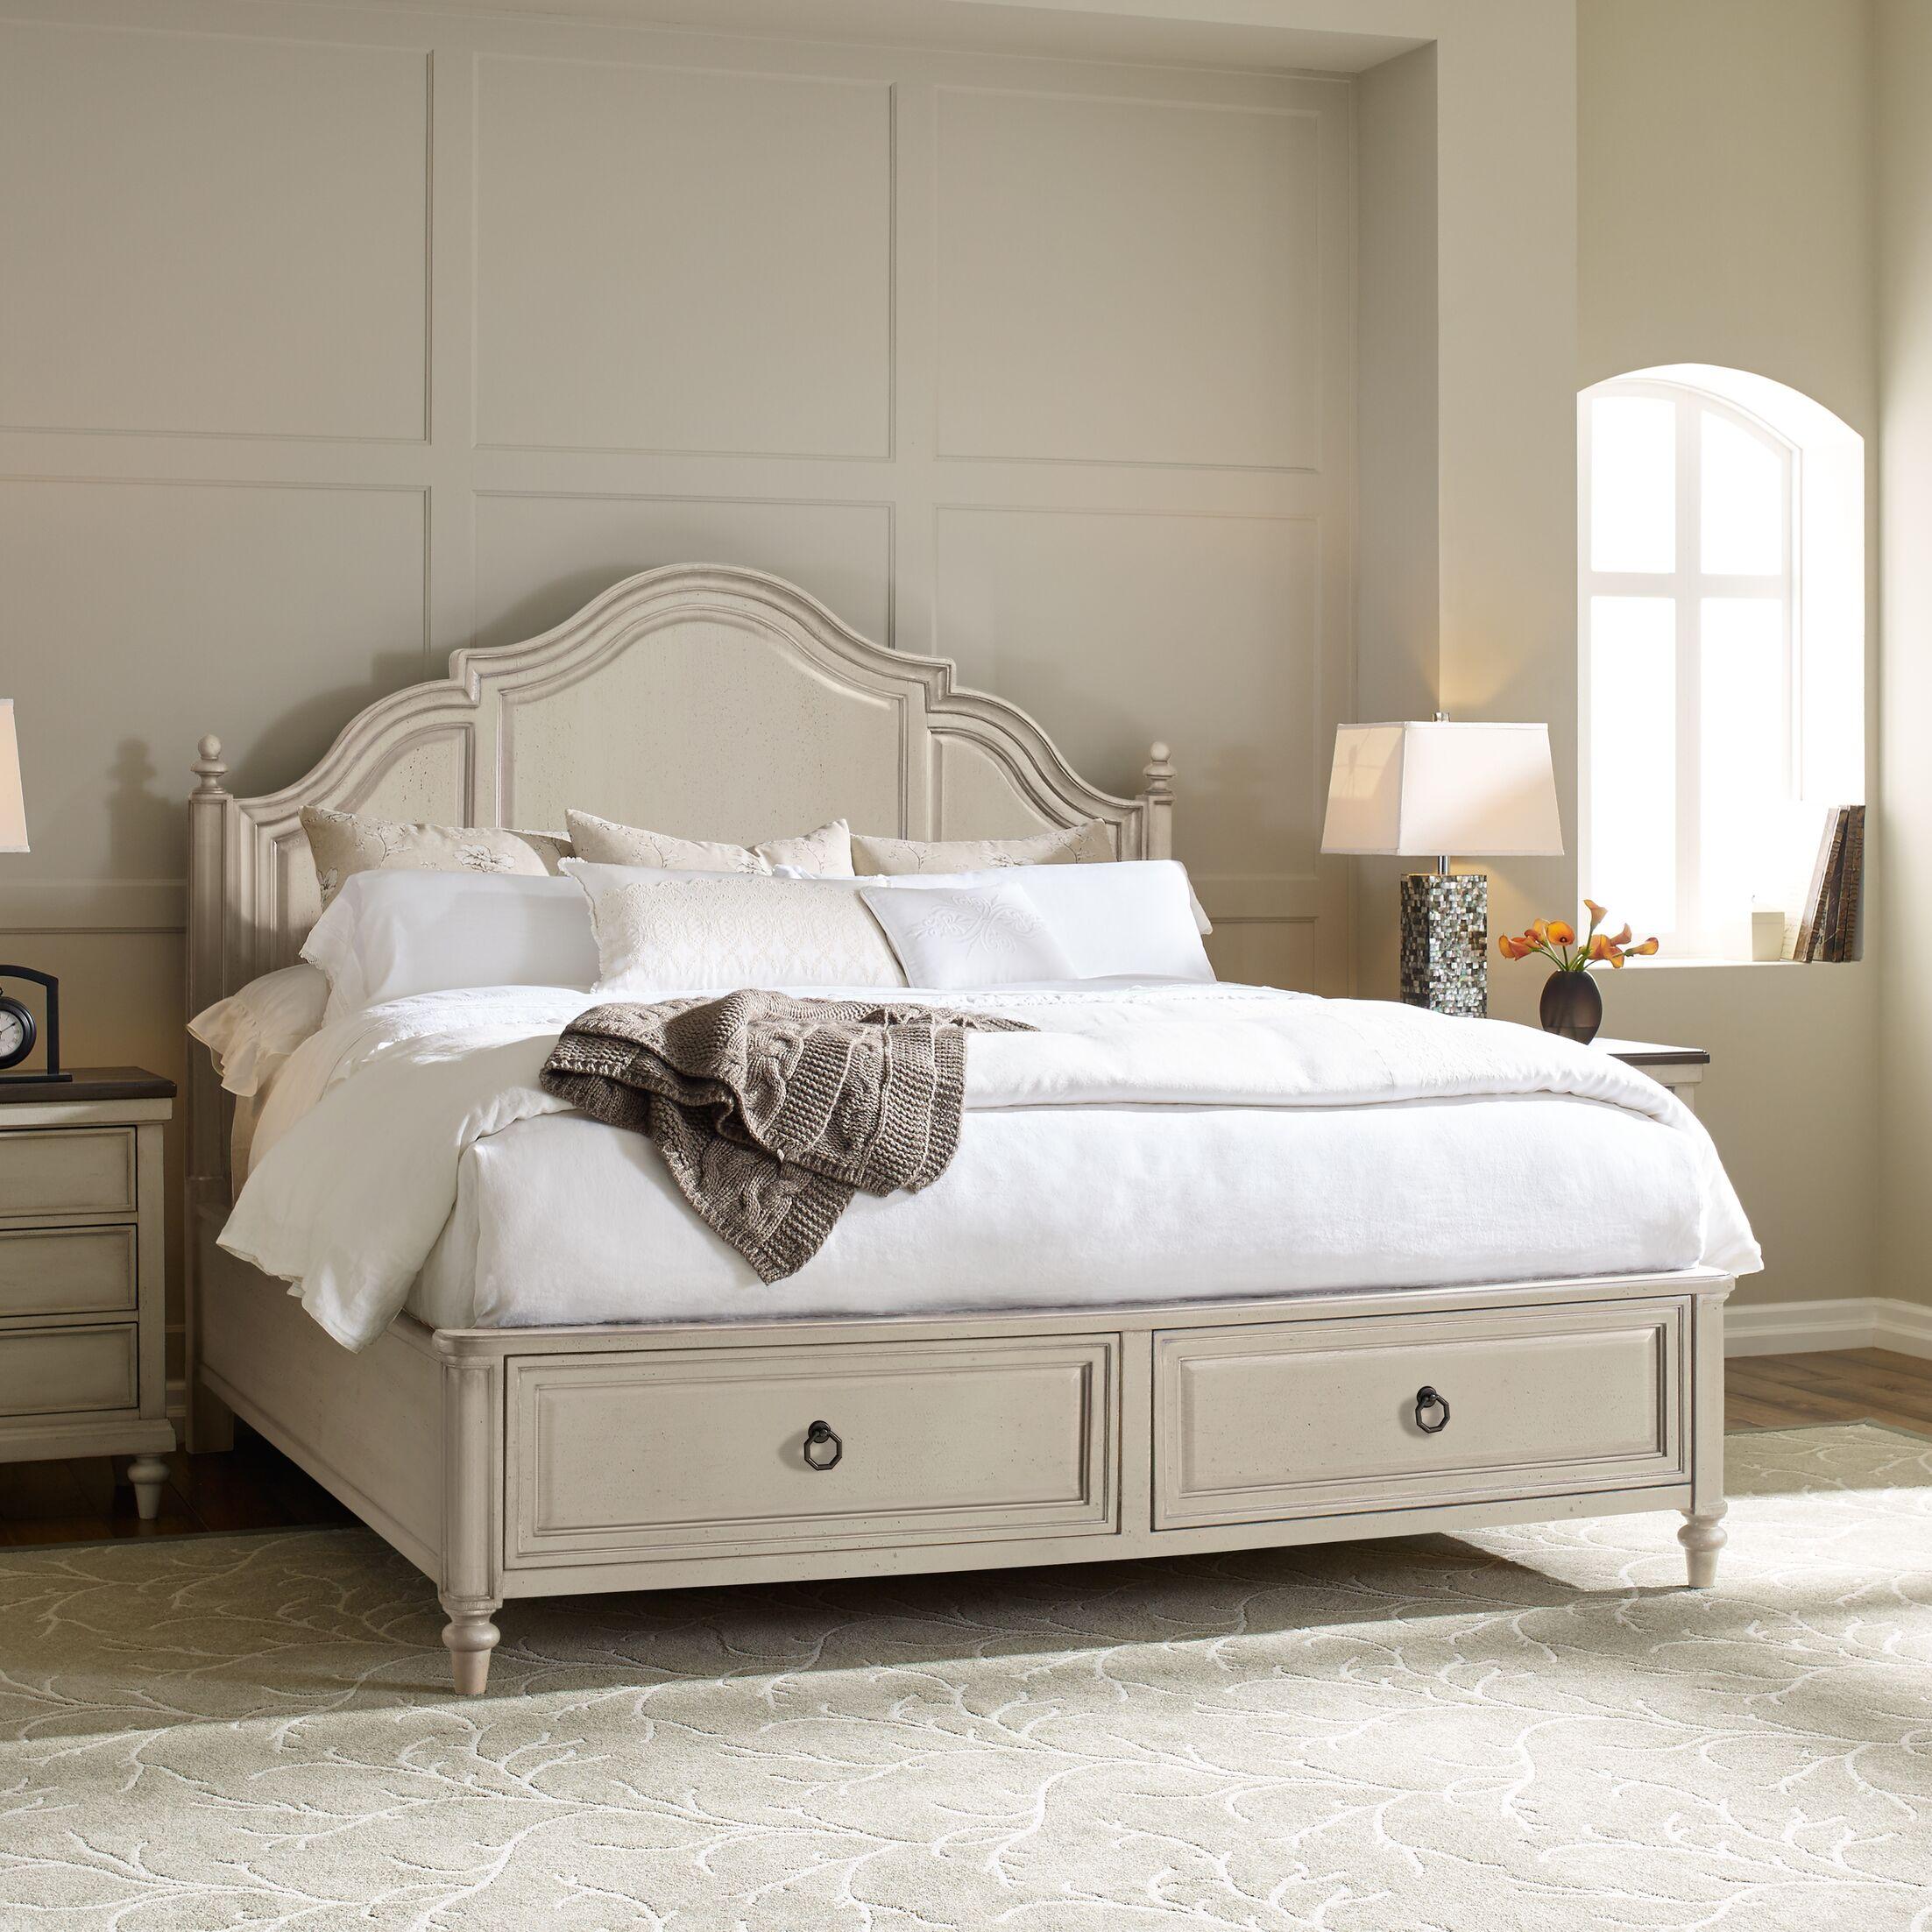 Bruyere Storage Platform Bed Size: Queen, Color: Vintage Linen